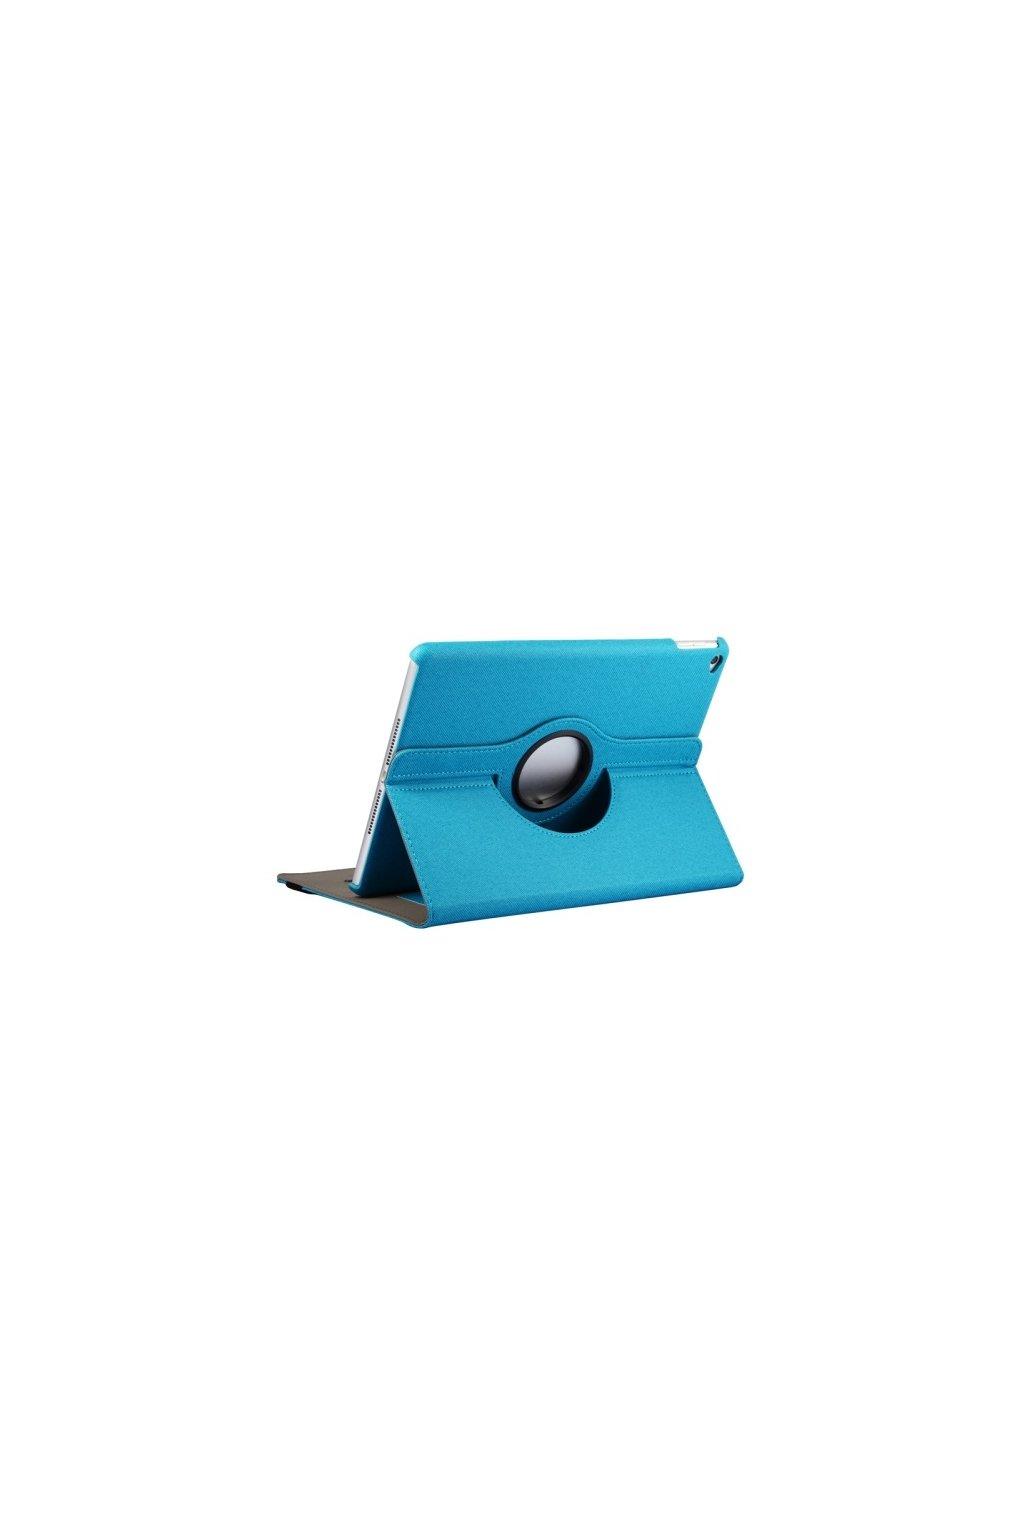 Pouzdro Denim iPad Air 2, blue/světle modrá